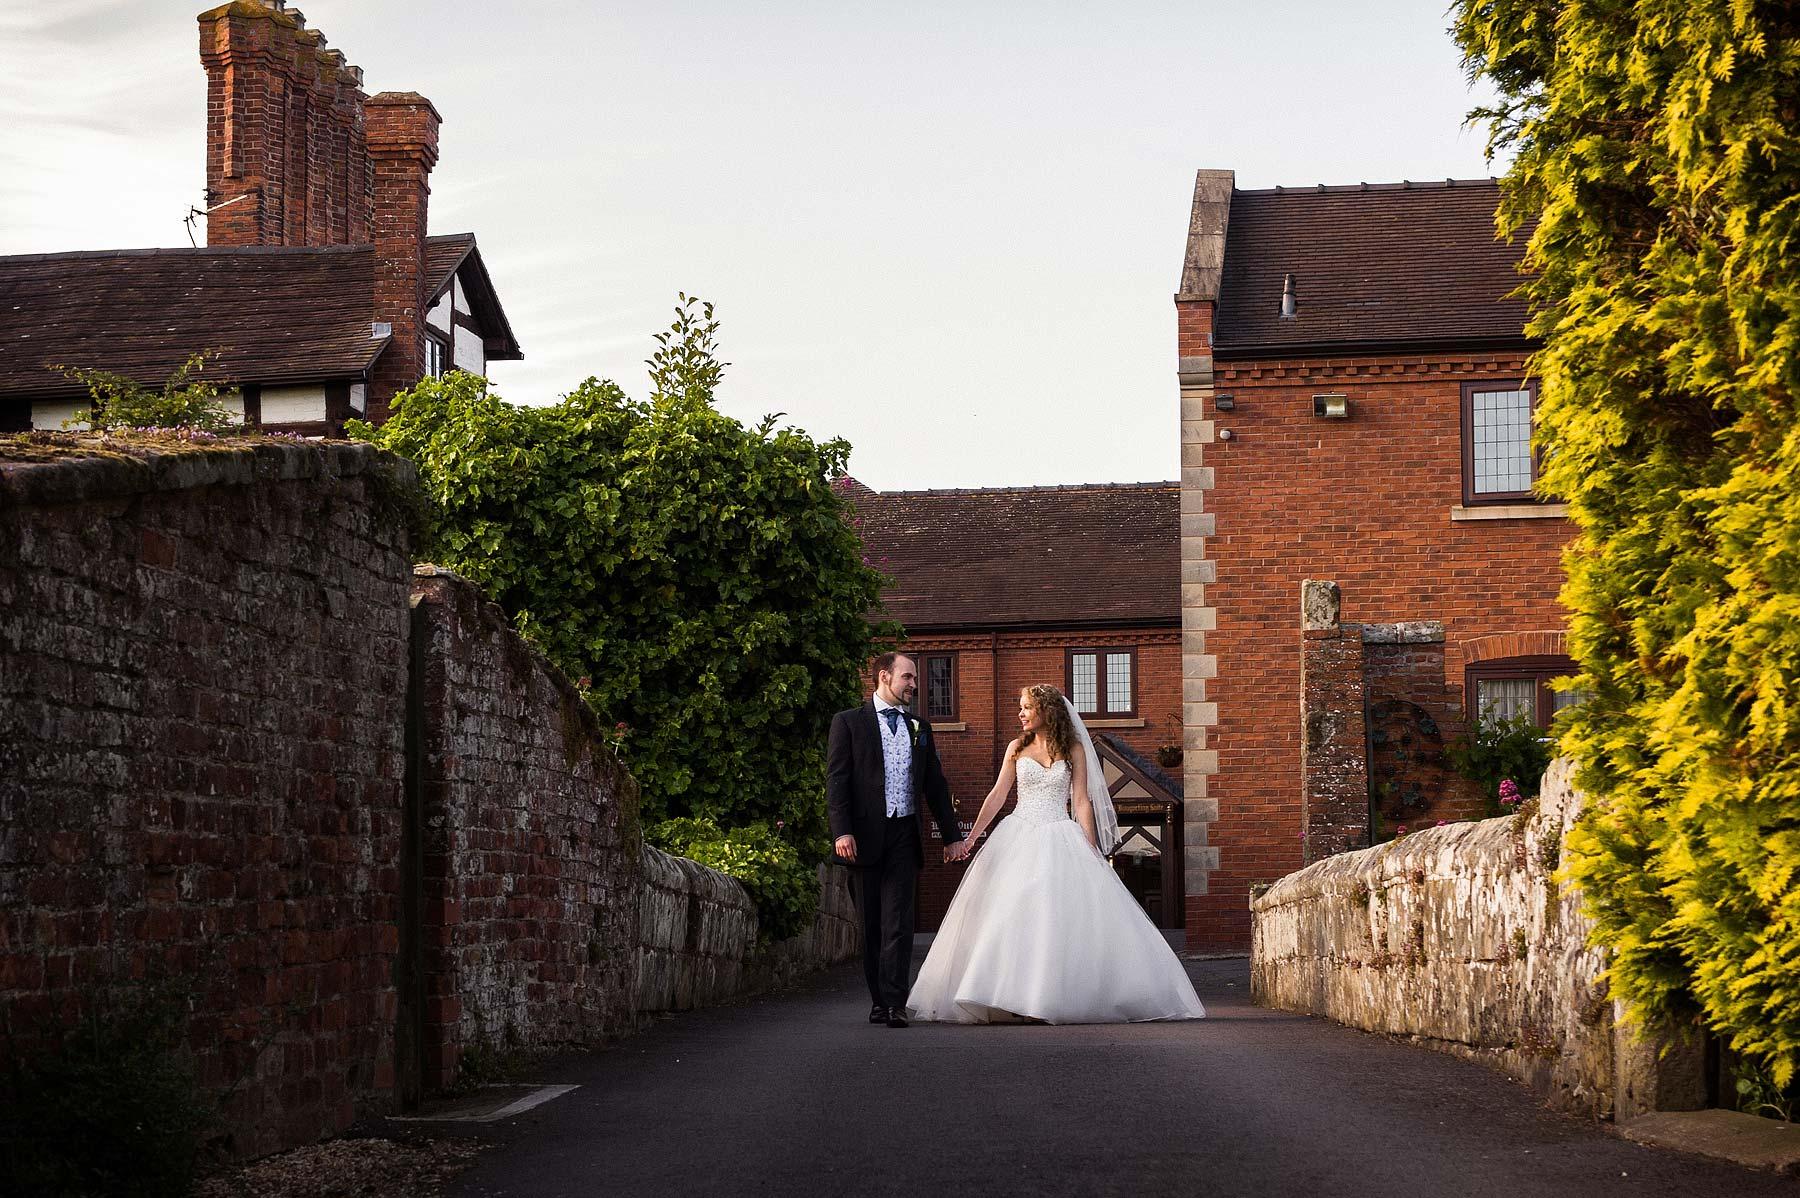 albright-hussey-manor-wedding-photographers-060